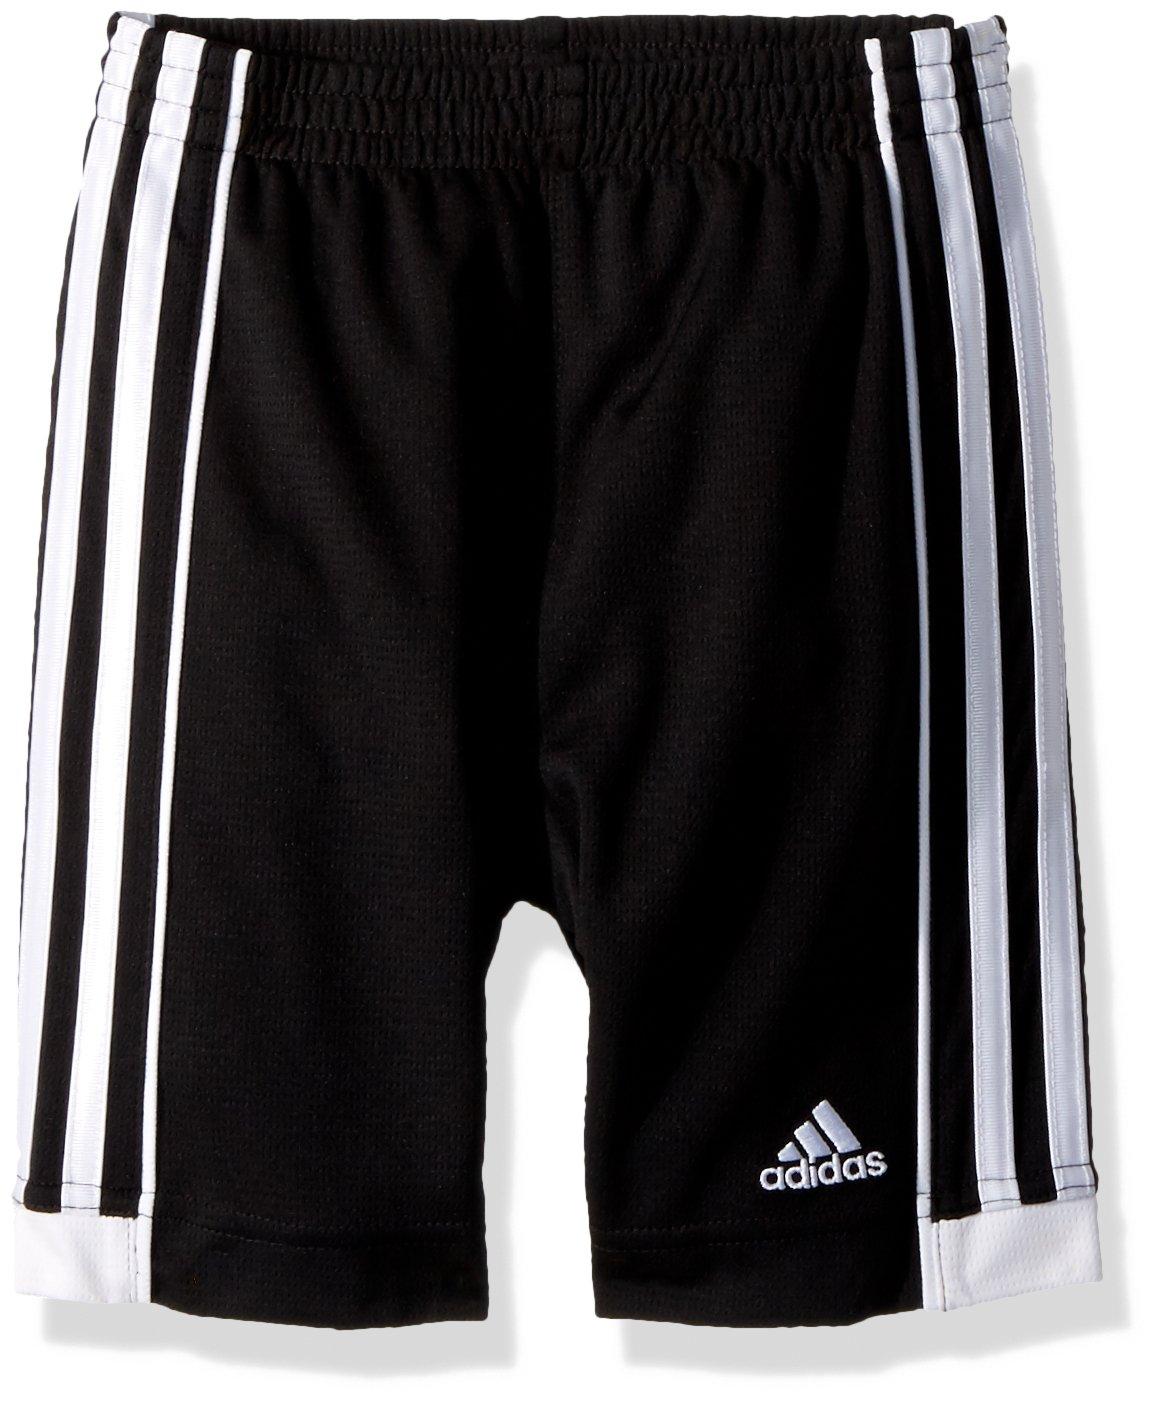 adidas Boys' Little Replen Active Mesh Short, Black